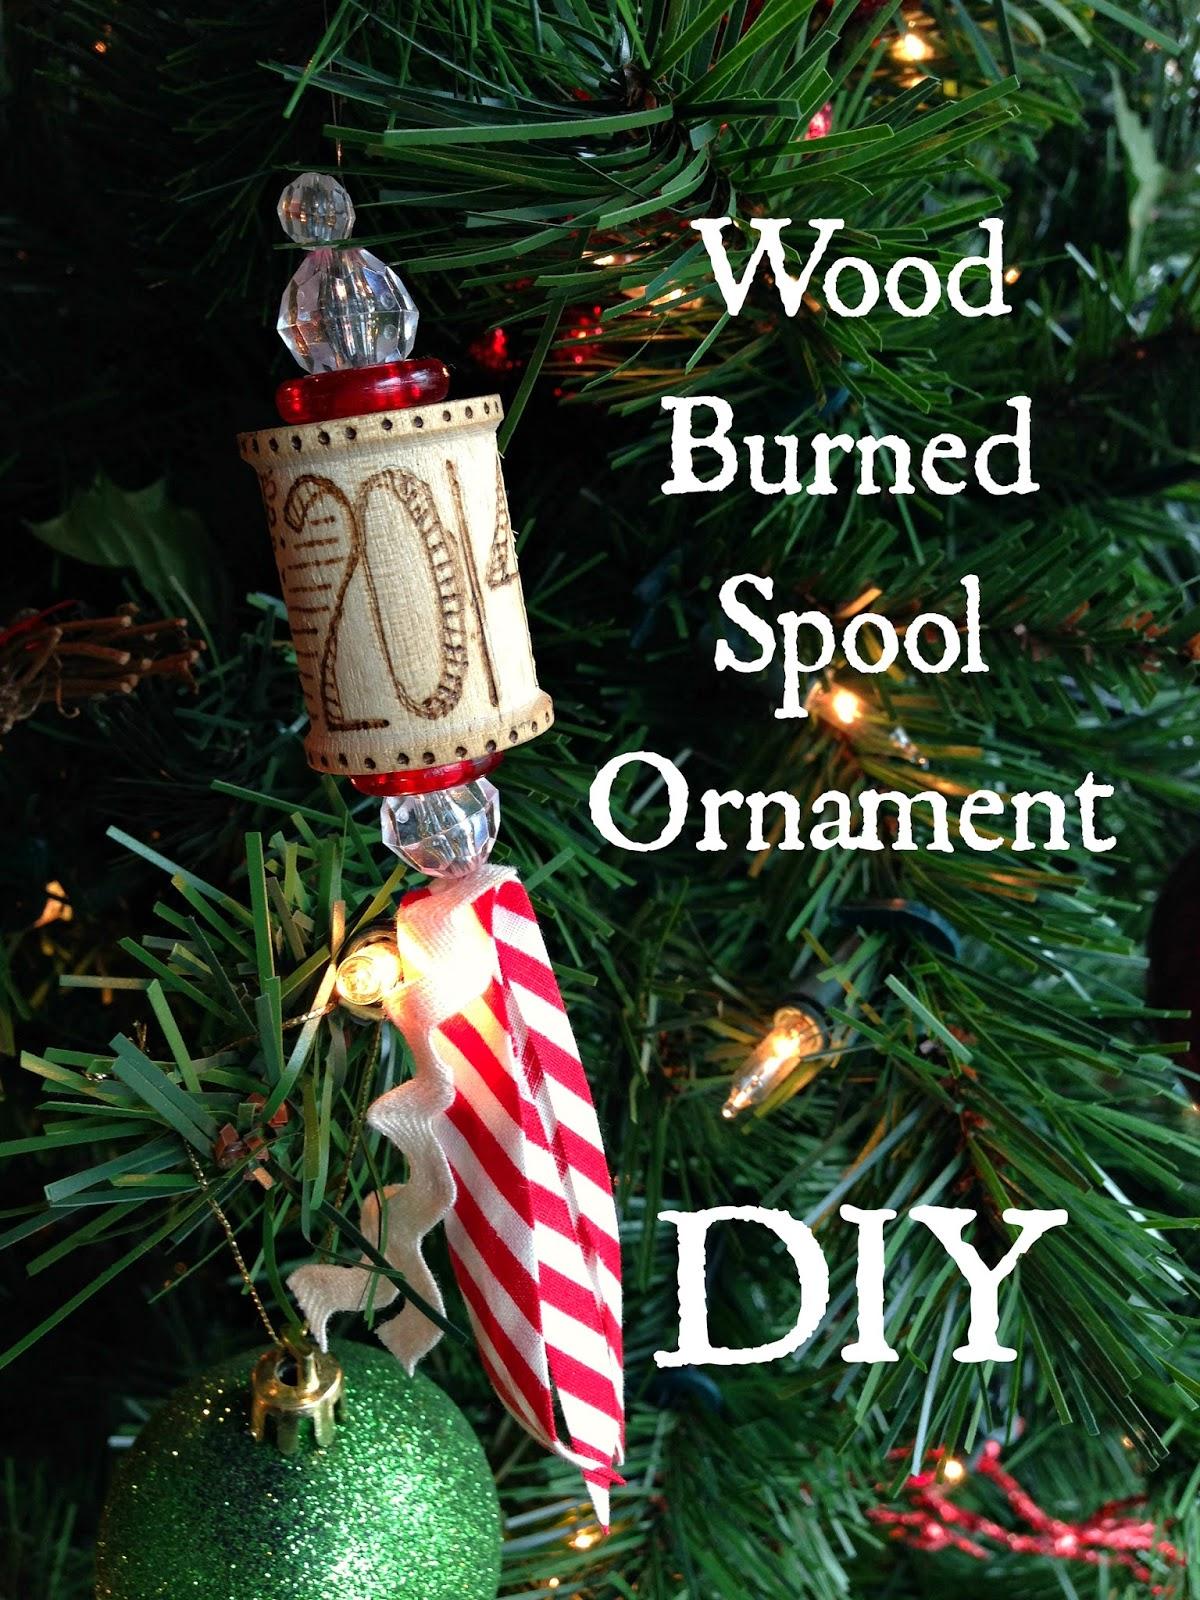 WhiMSy love: DIY: Wood Burned Spool Ornament